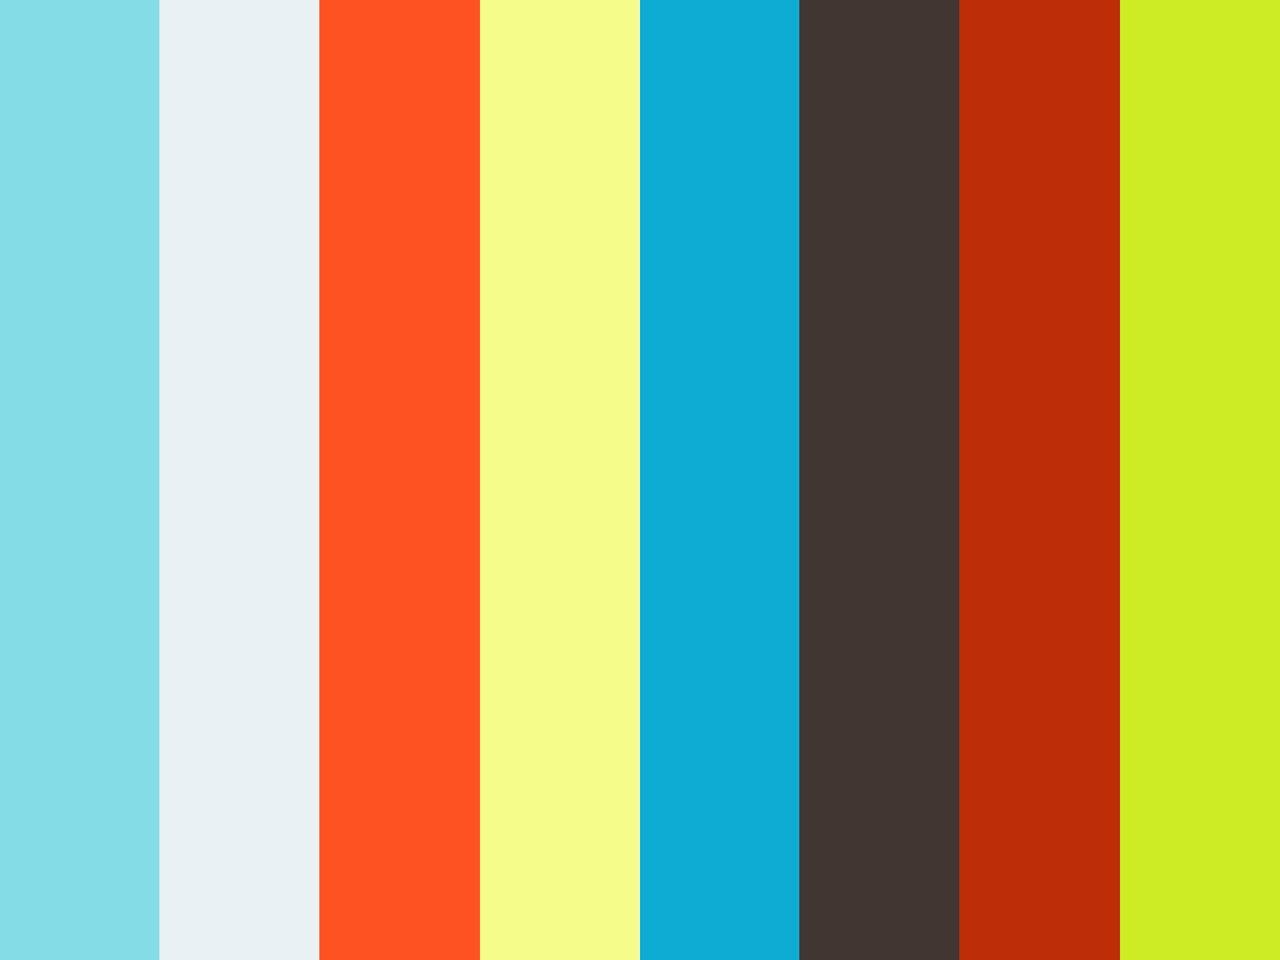 DER HIMMEL ÜBER BERLIN | Wim Wenders | Trailer (German)